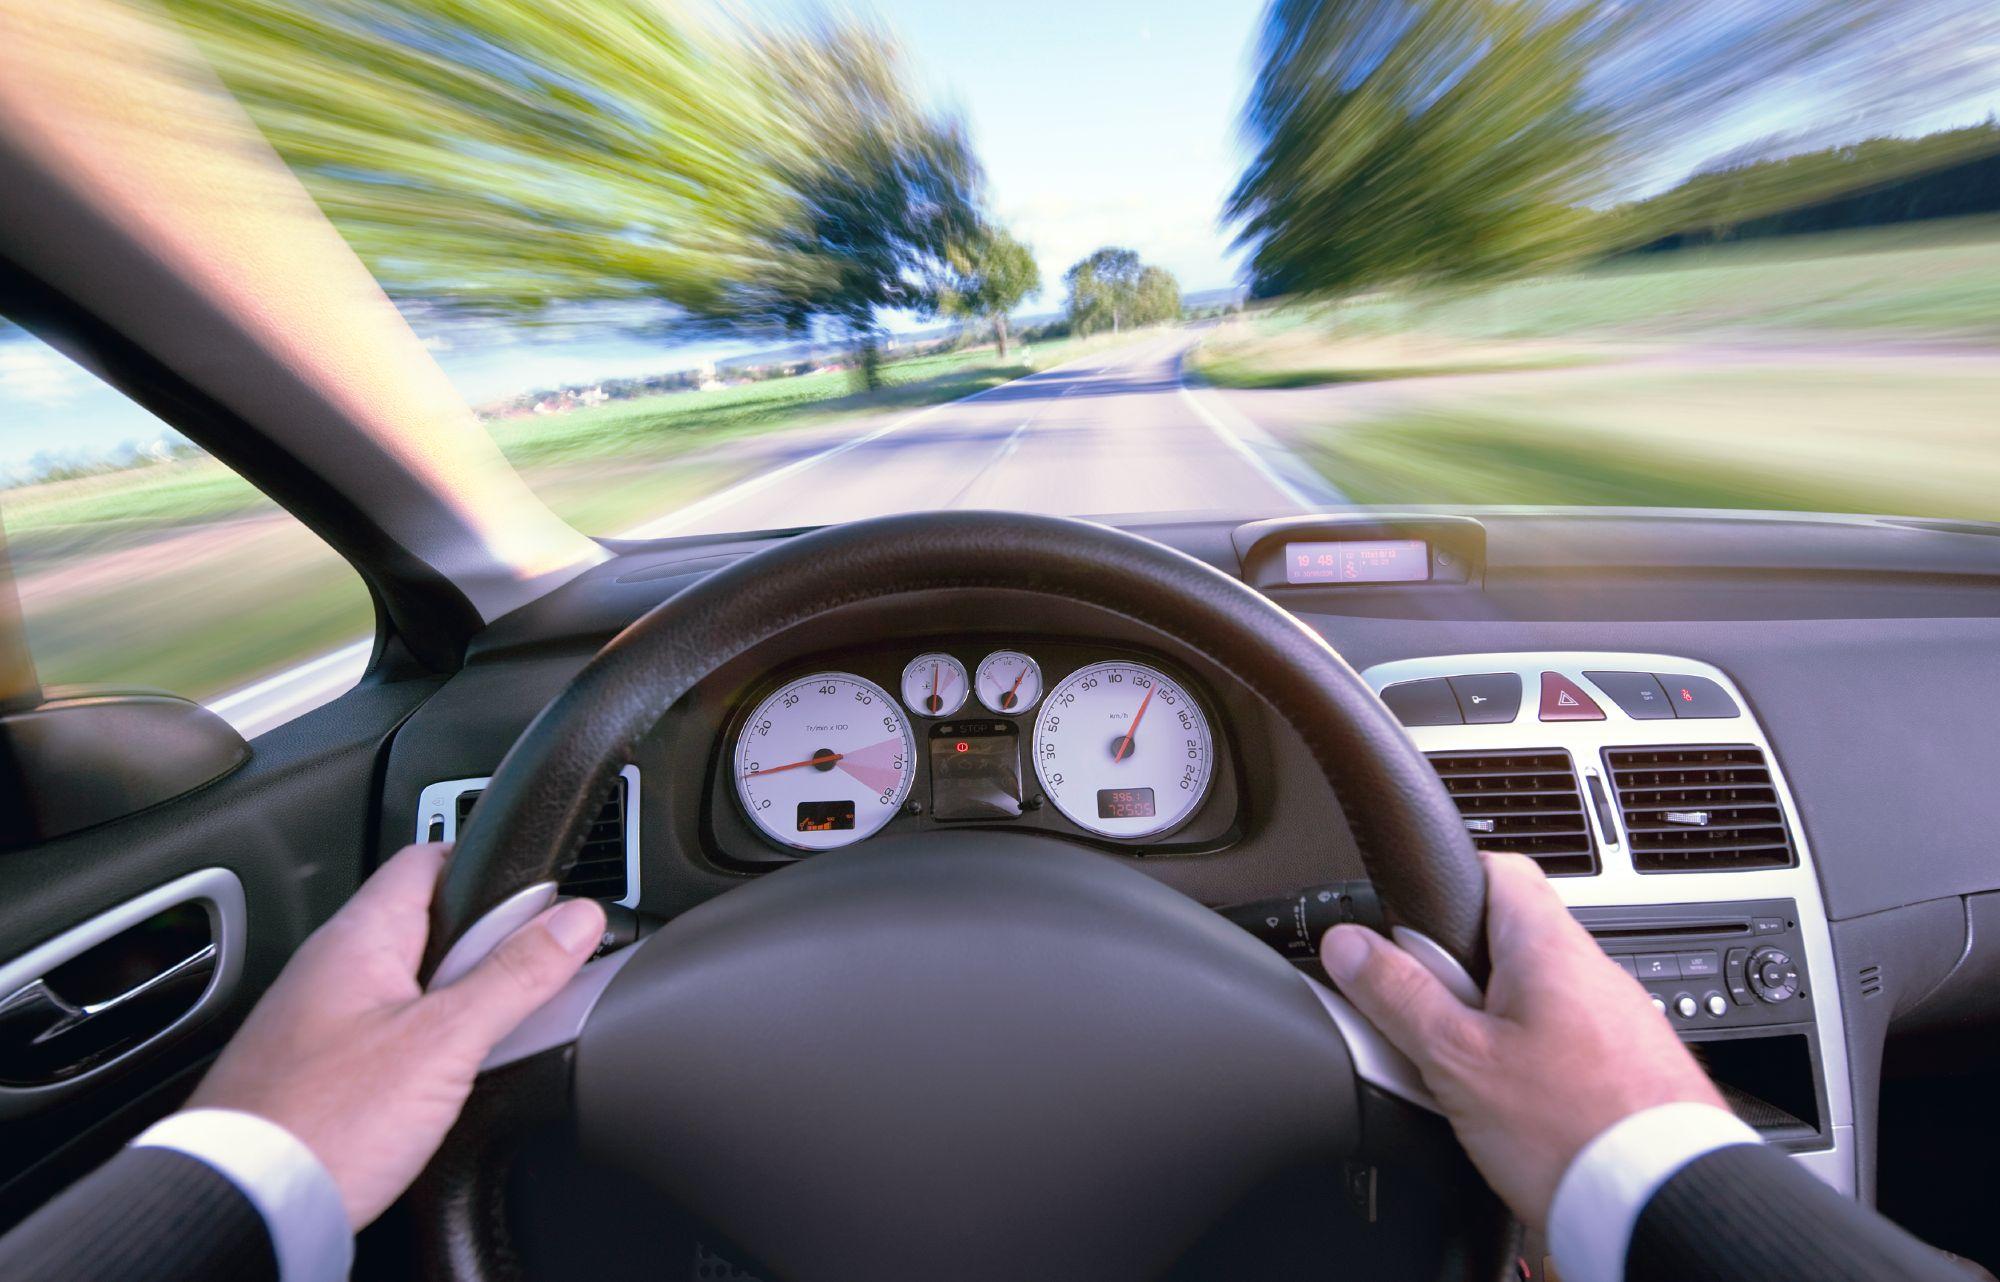 шумоизоляция и виброизоляция автомобиля-28